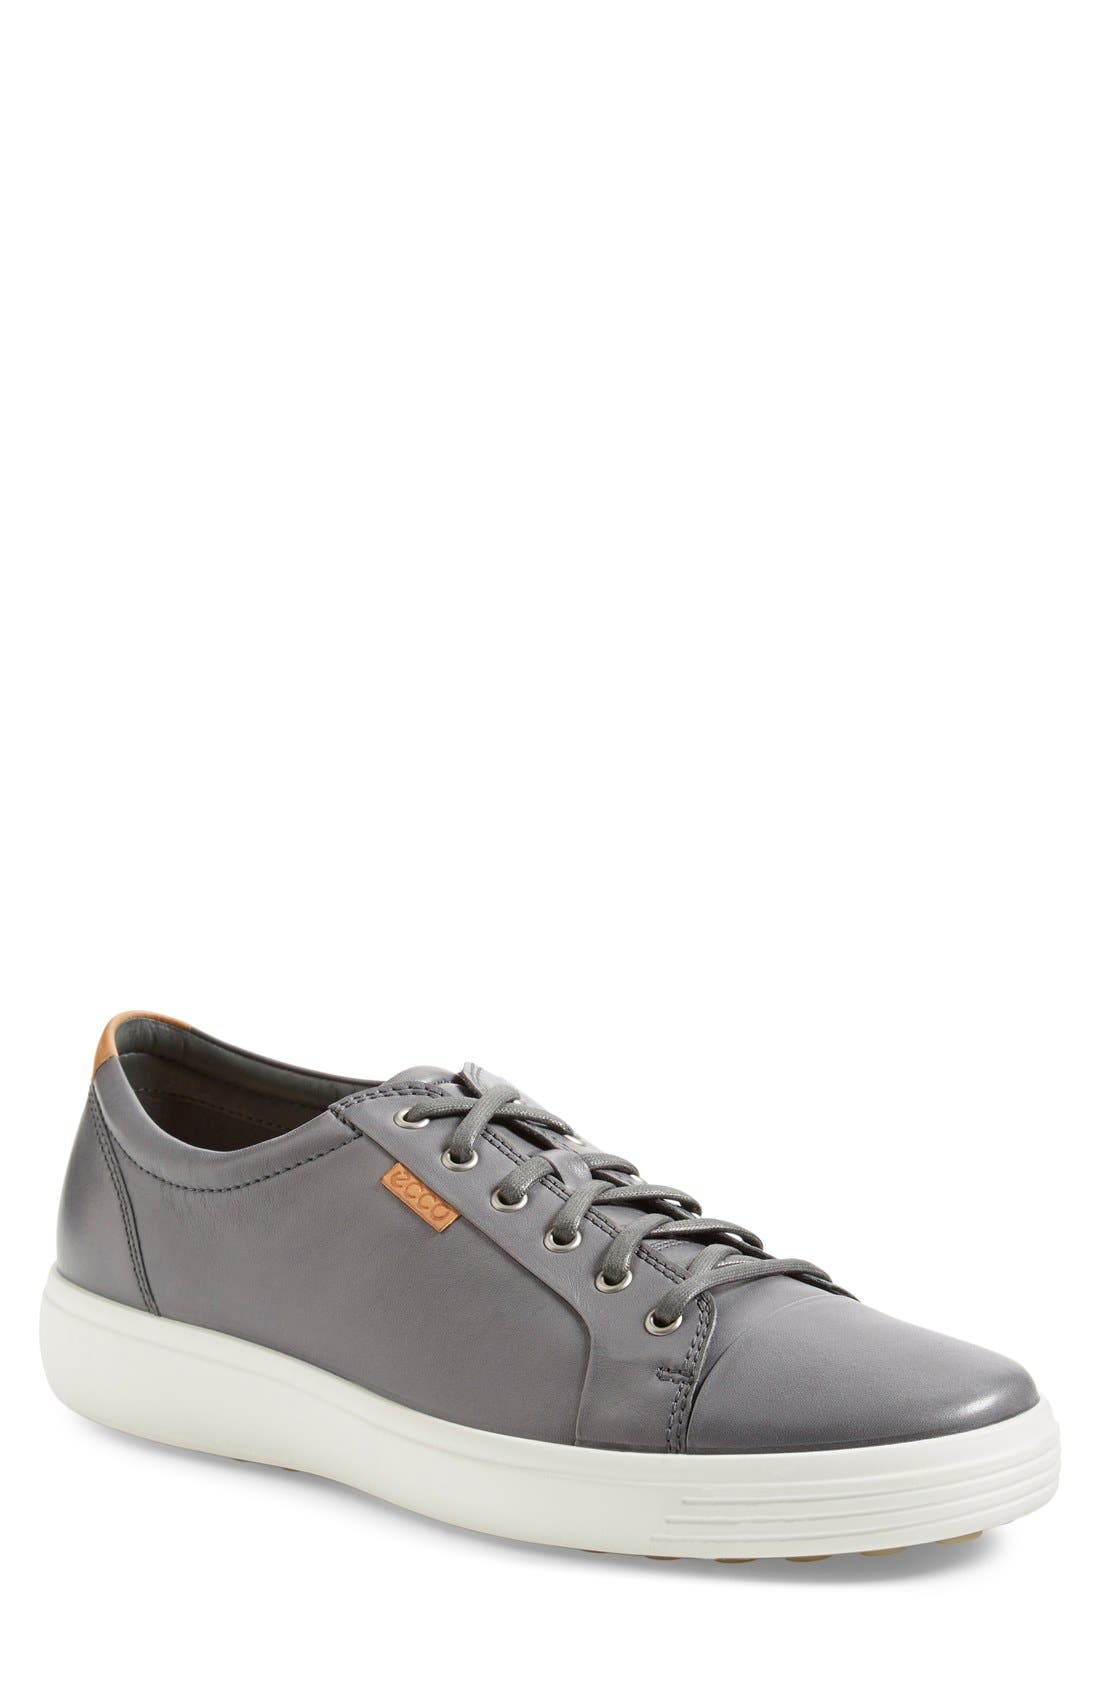 Main Image - ECCOSoft VII Lace-Up Sneaker (Men)